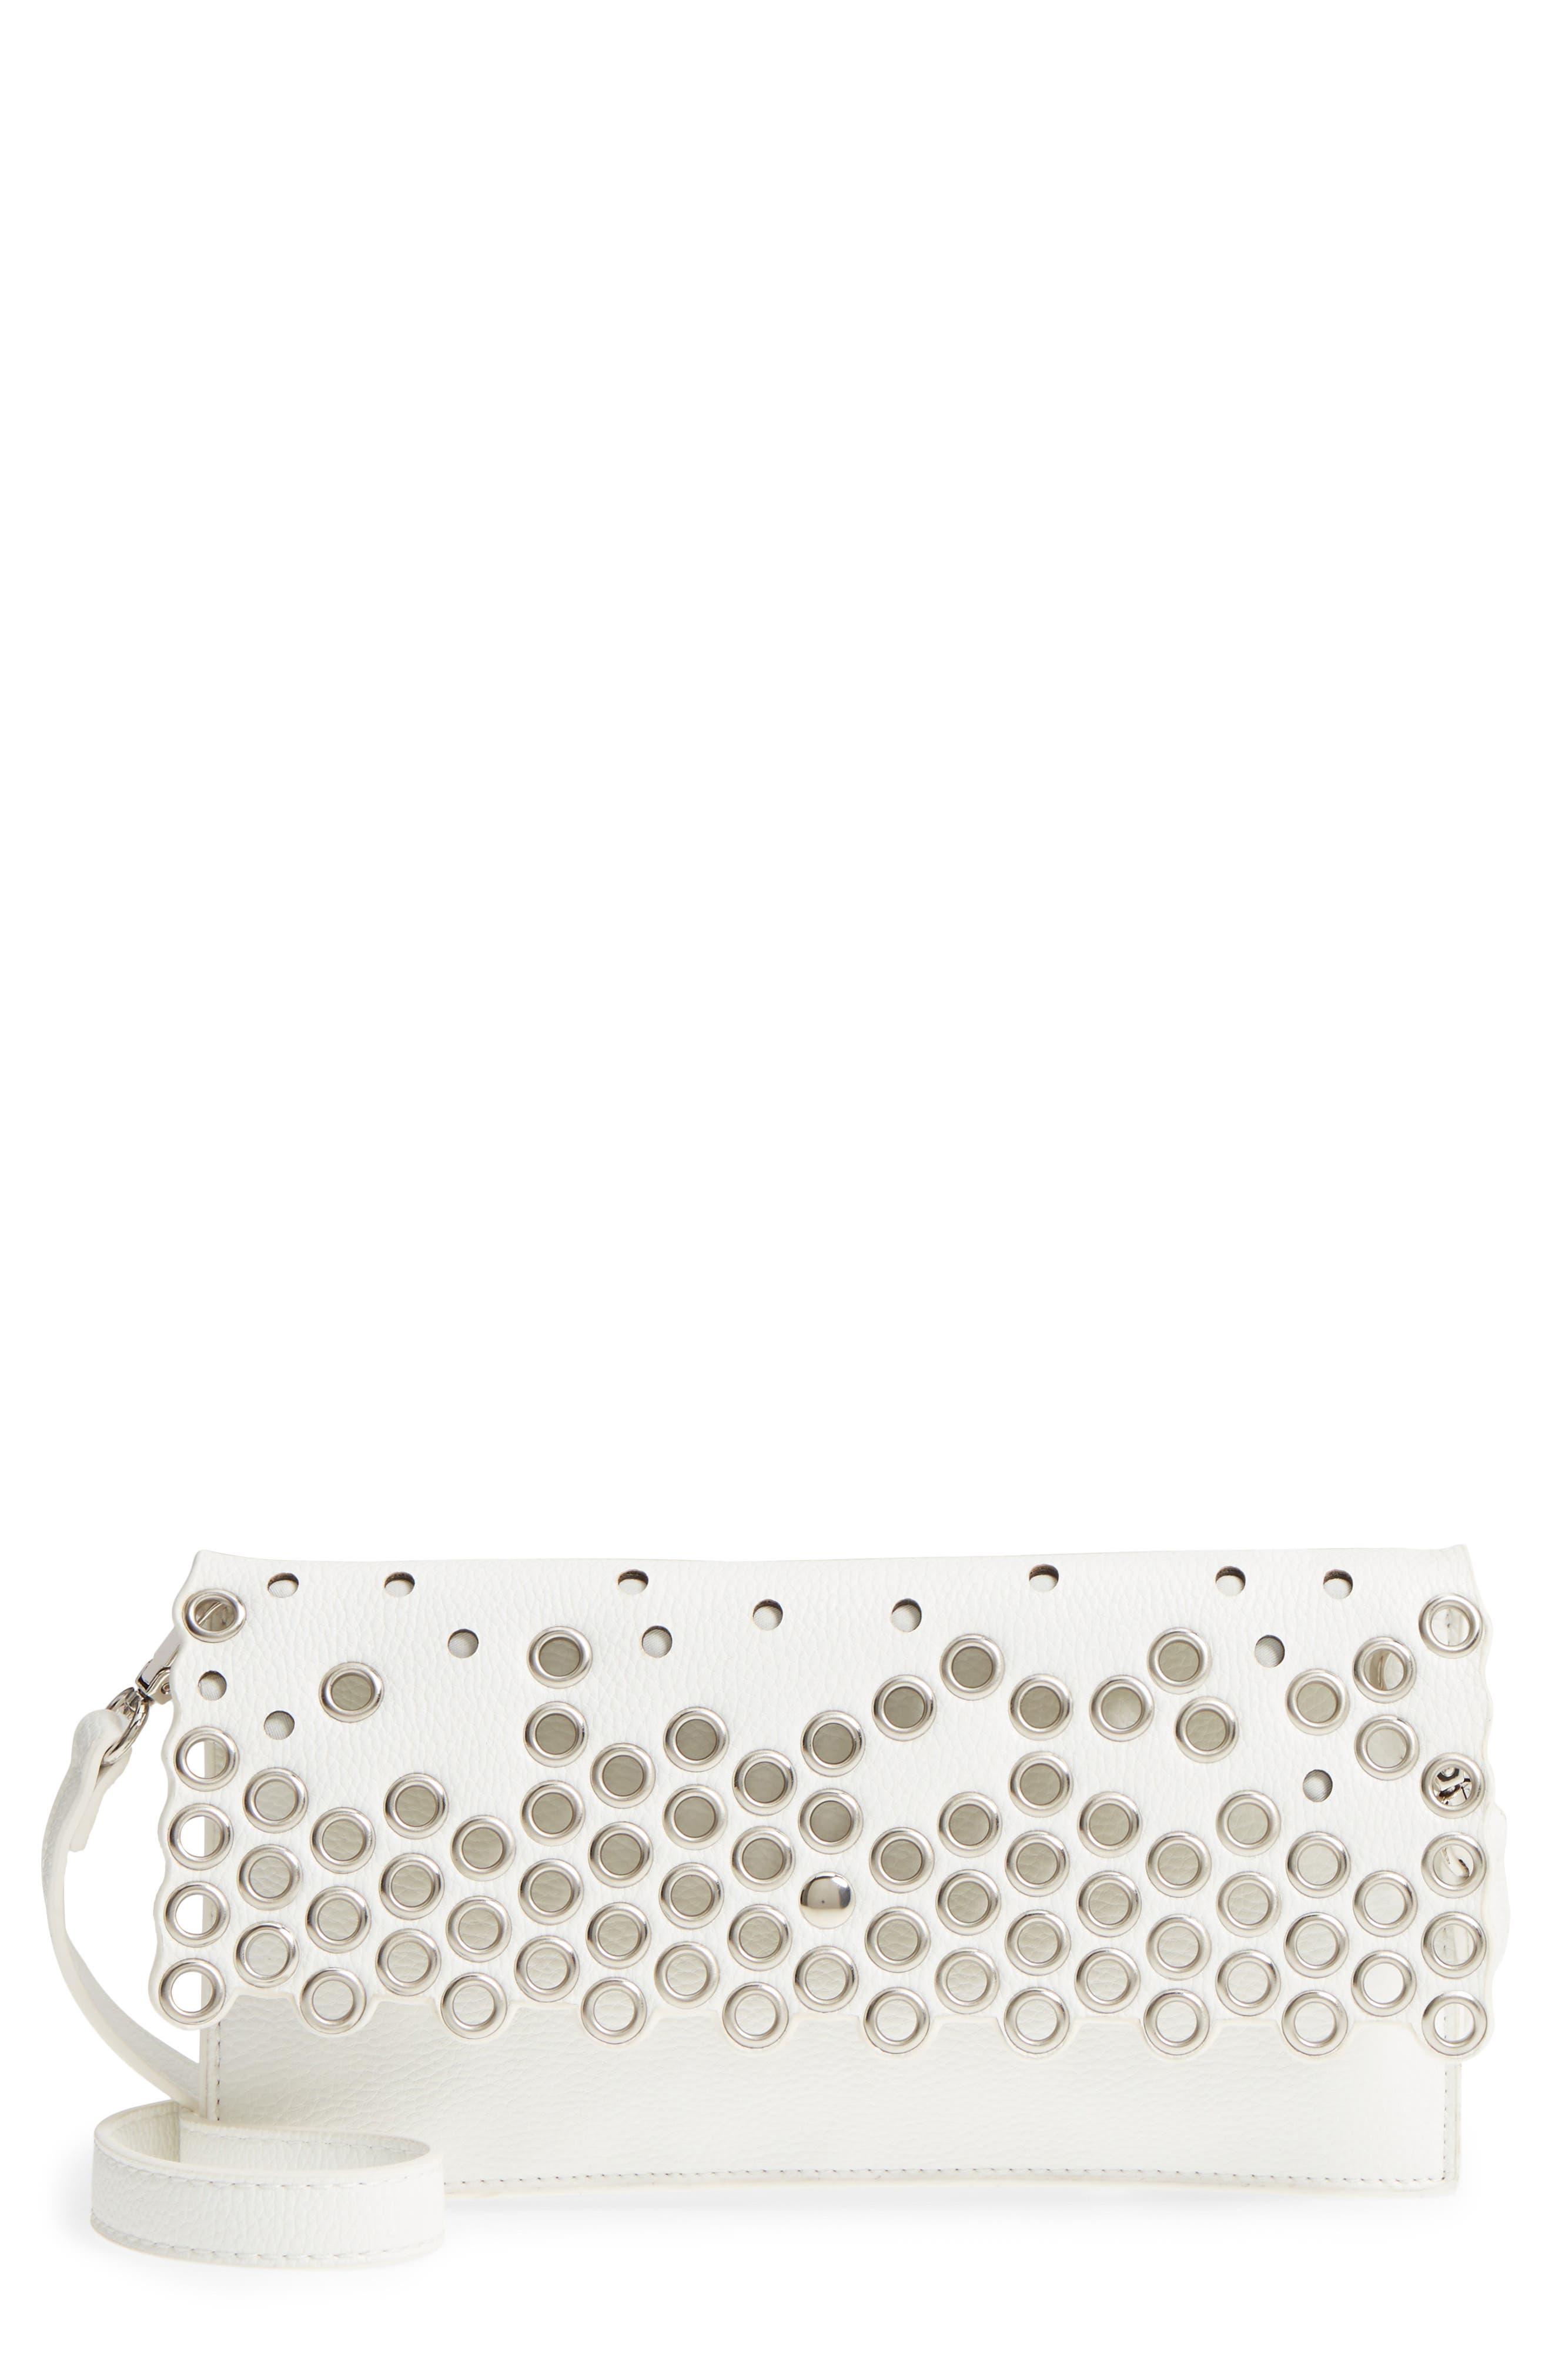 Grommet Convertible Crossbody Bag,                             Main thumbnail 1, color,                             White